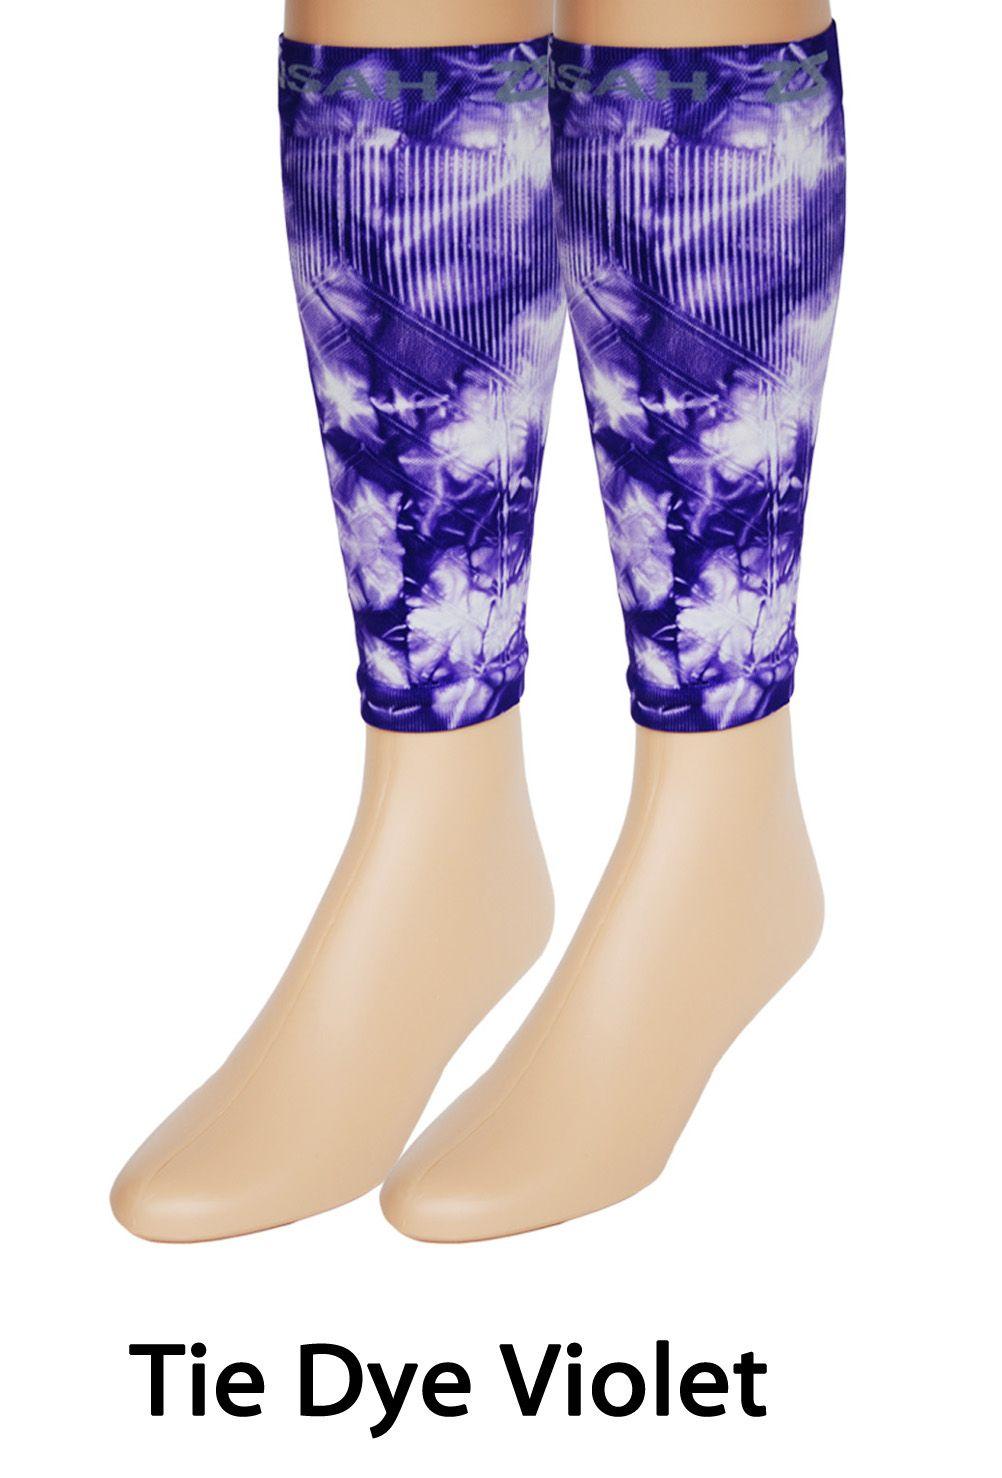 Run Seamless Long Sleeve Compression leg sleeves